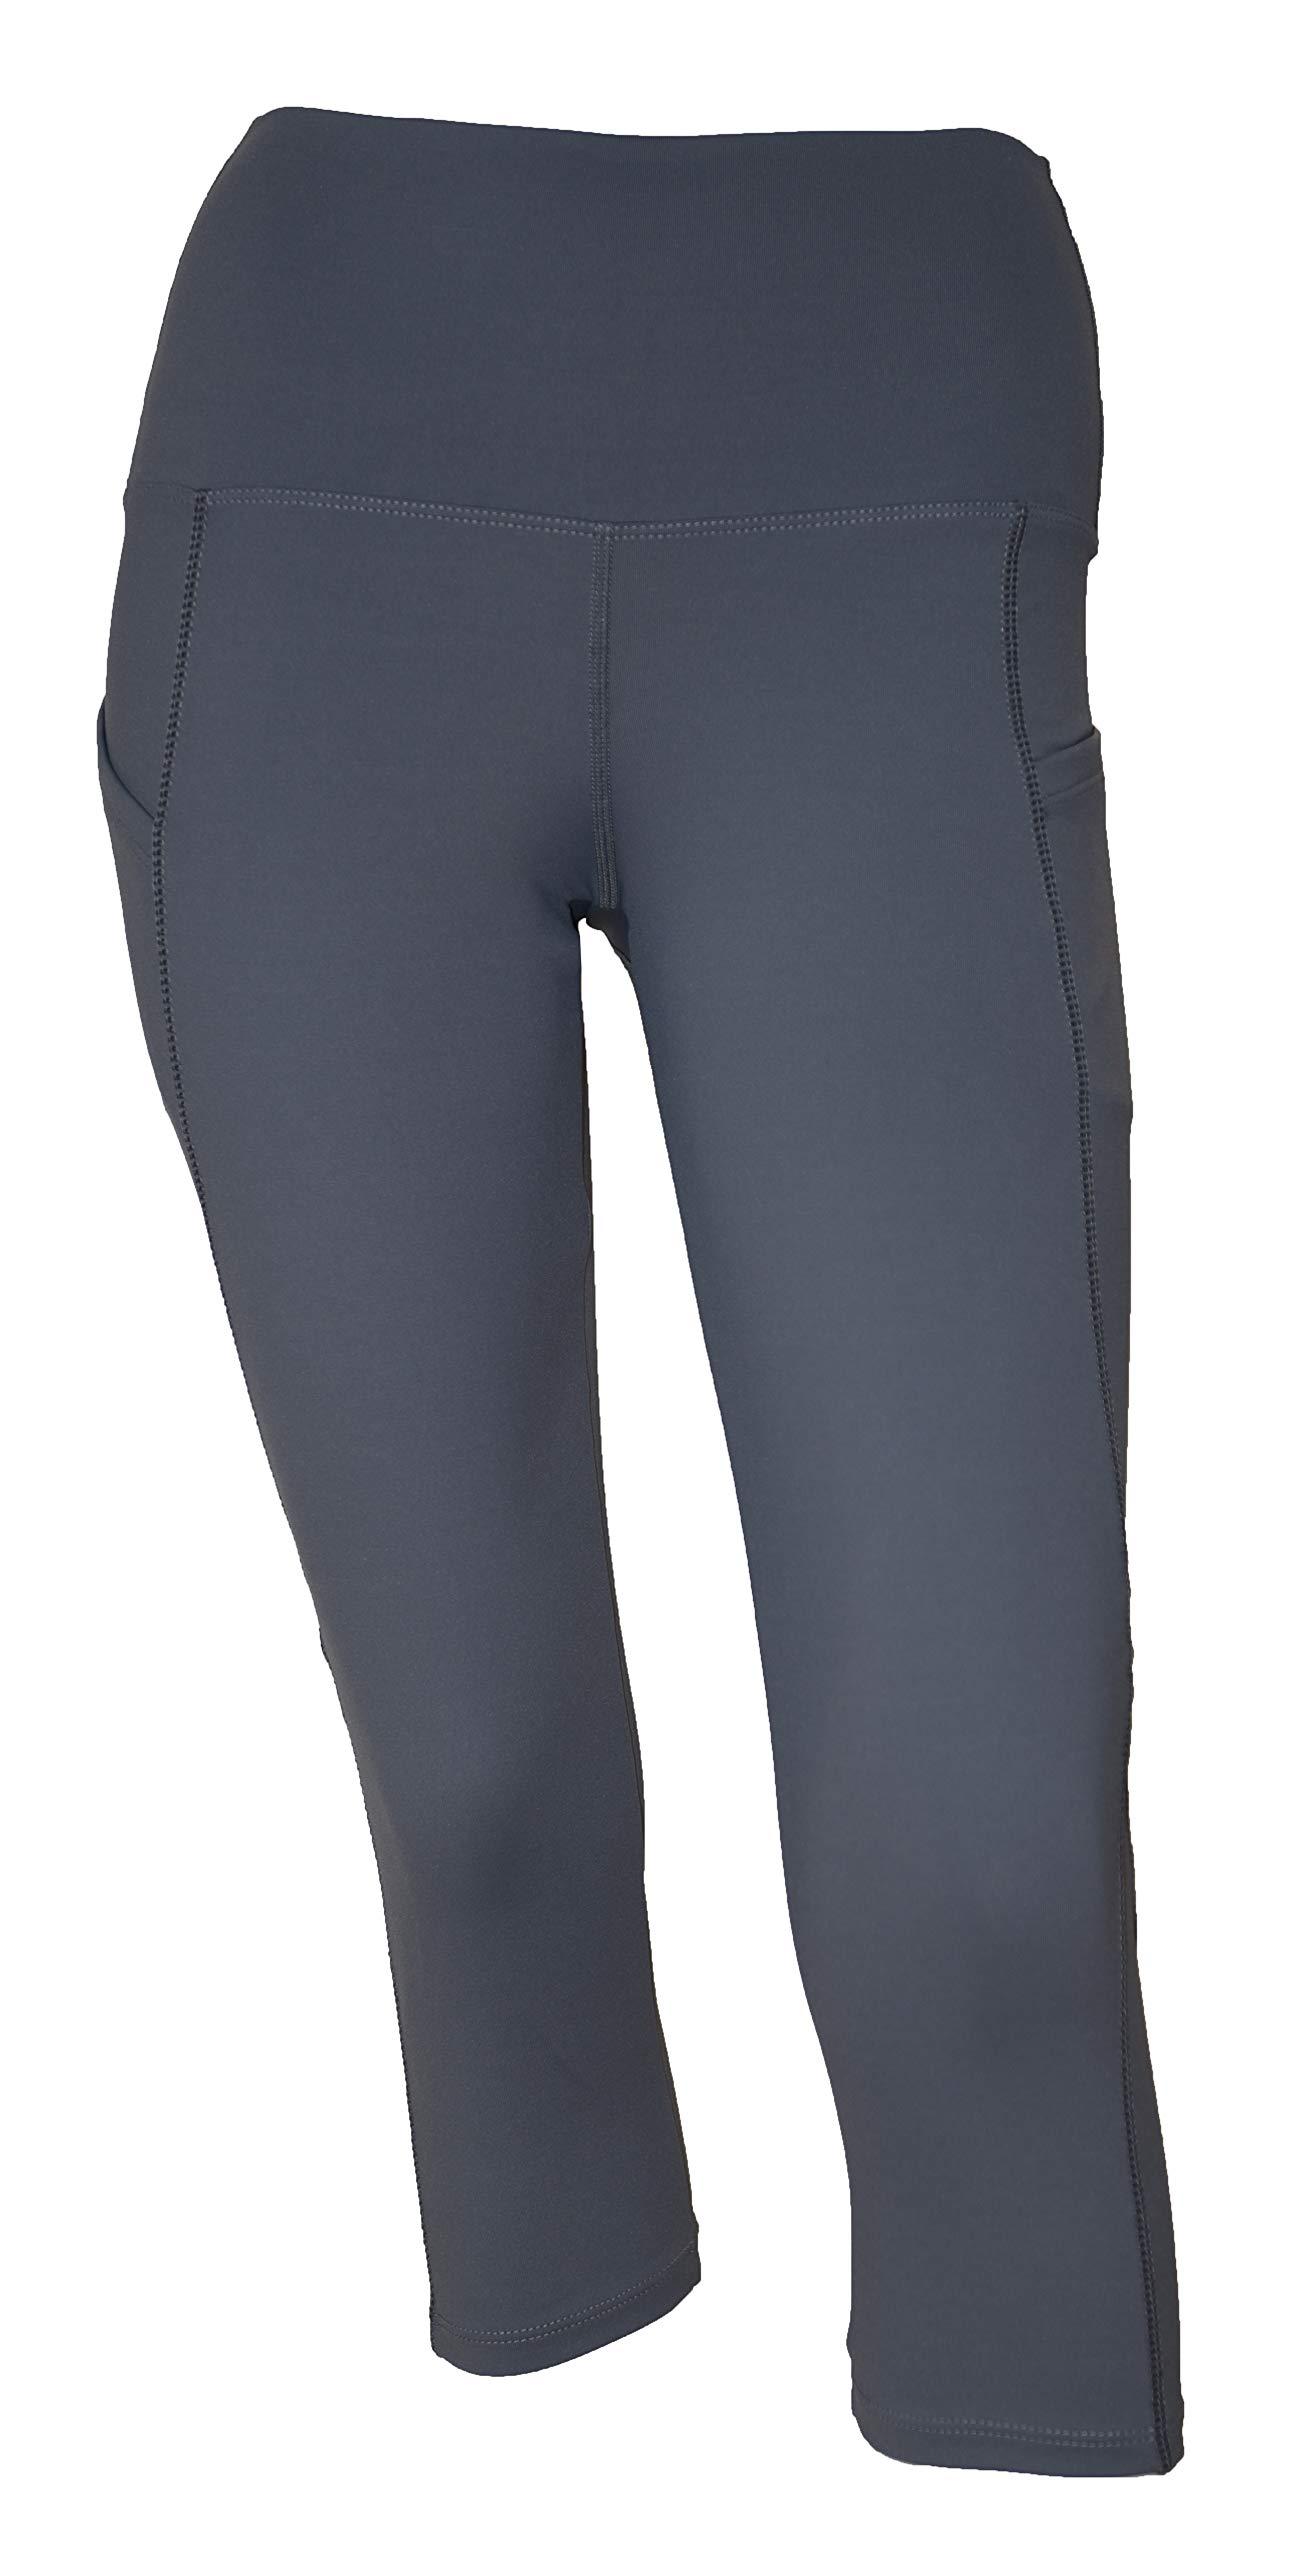 Private Island Women Swim Pockets Pants for UV Rashguard (Large, Grey) by Private Island